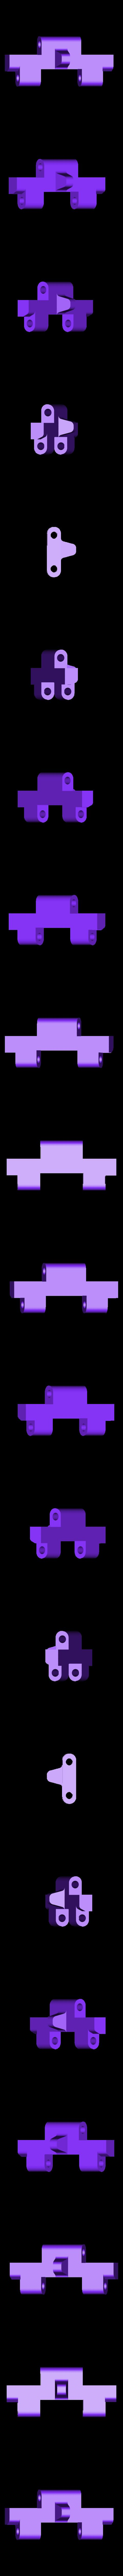 Kettenglied v5.stl Download STL file RC Speed Tank • 3D printable design, Bryant